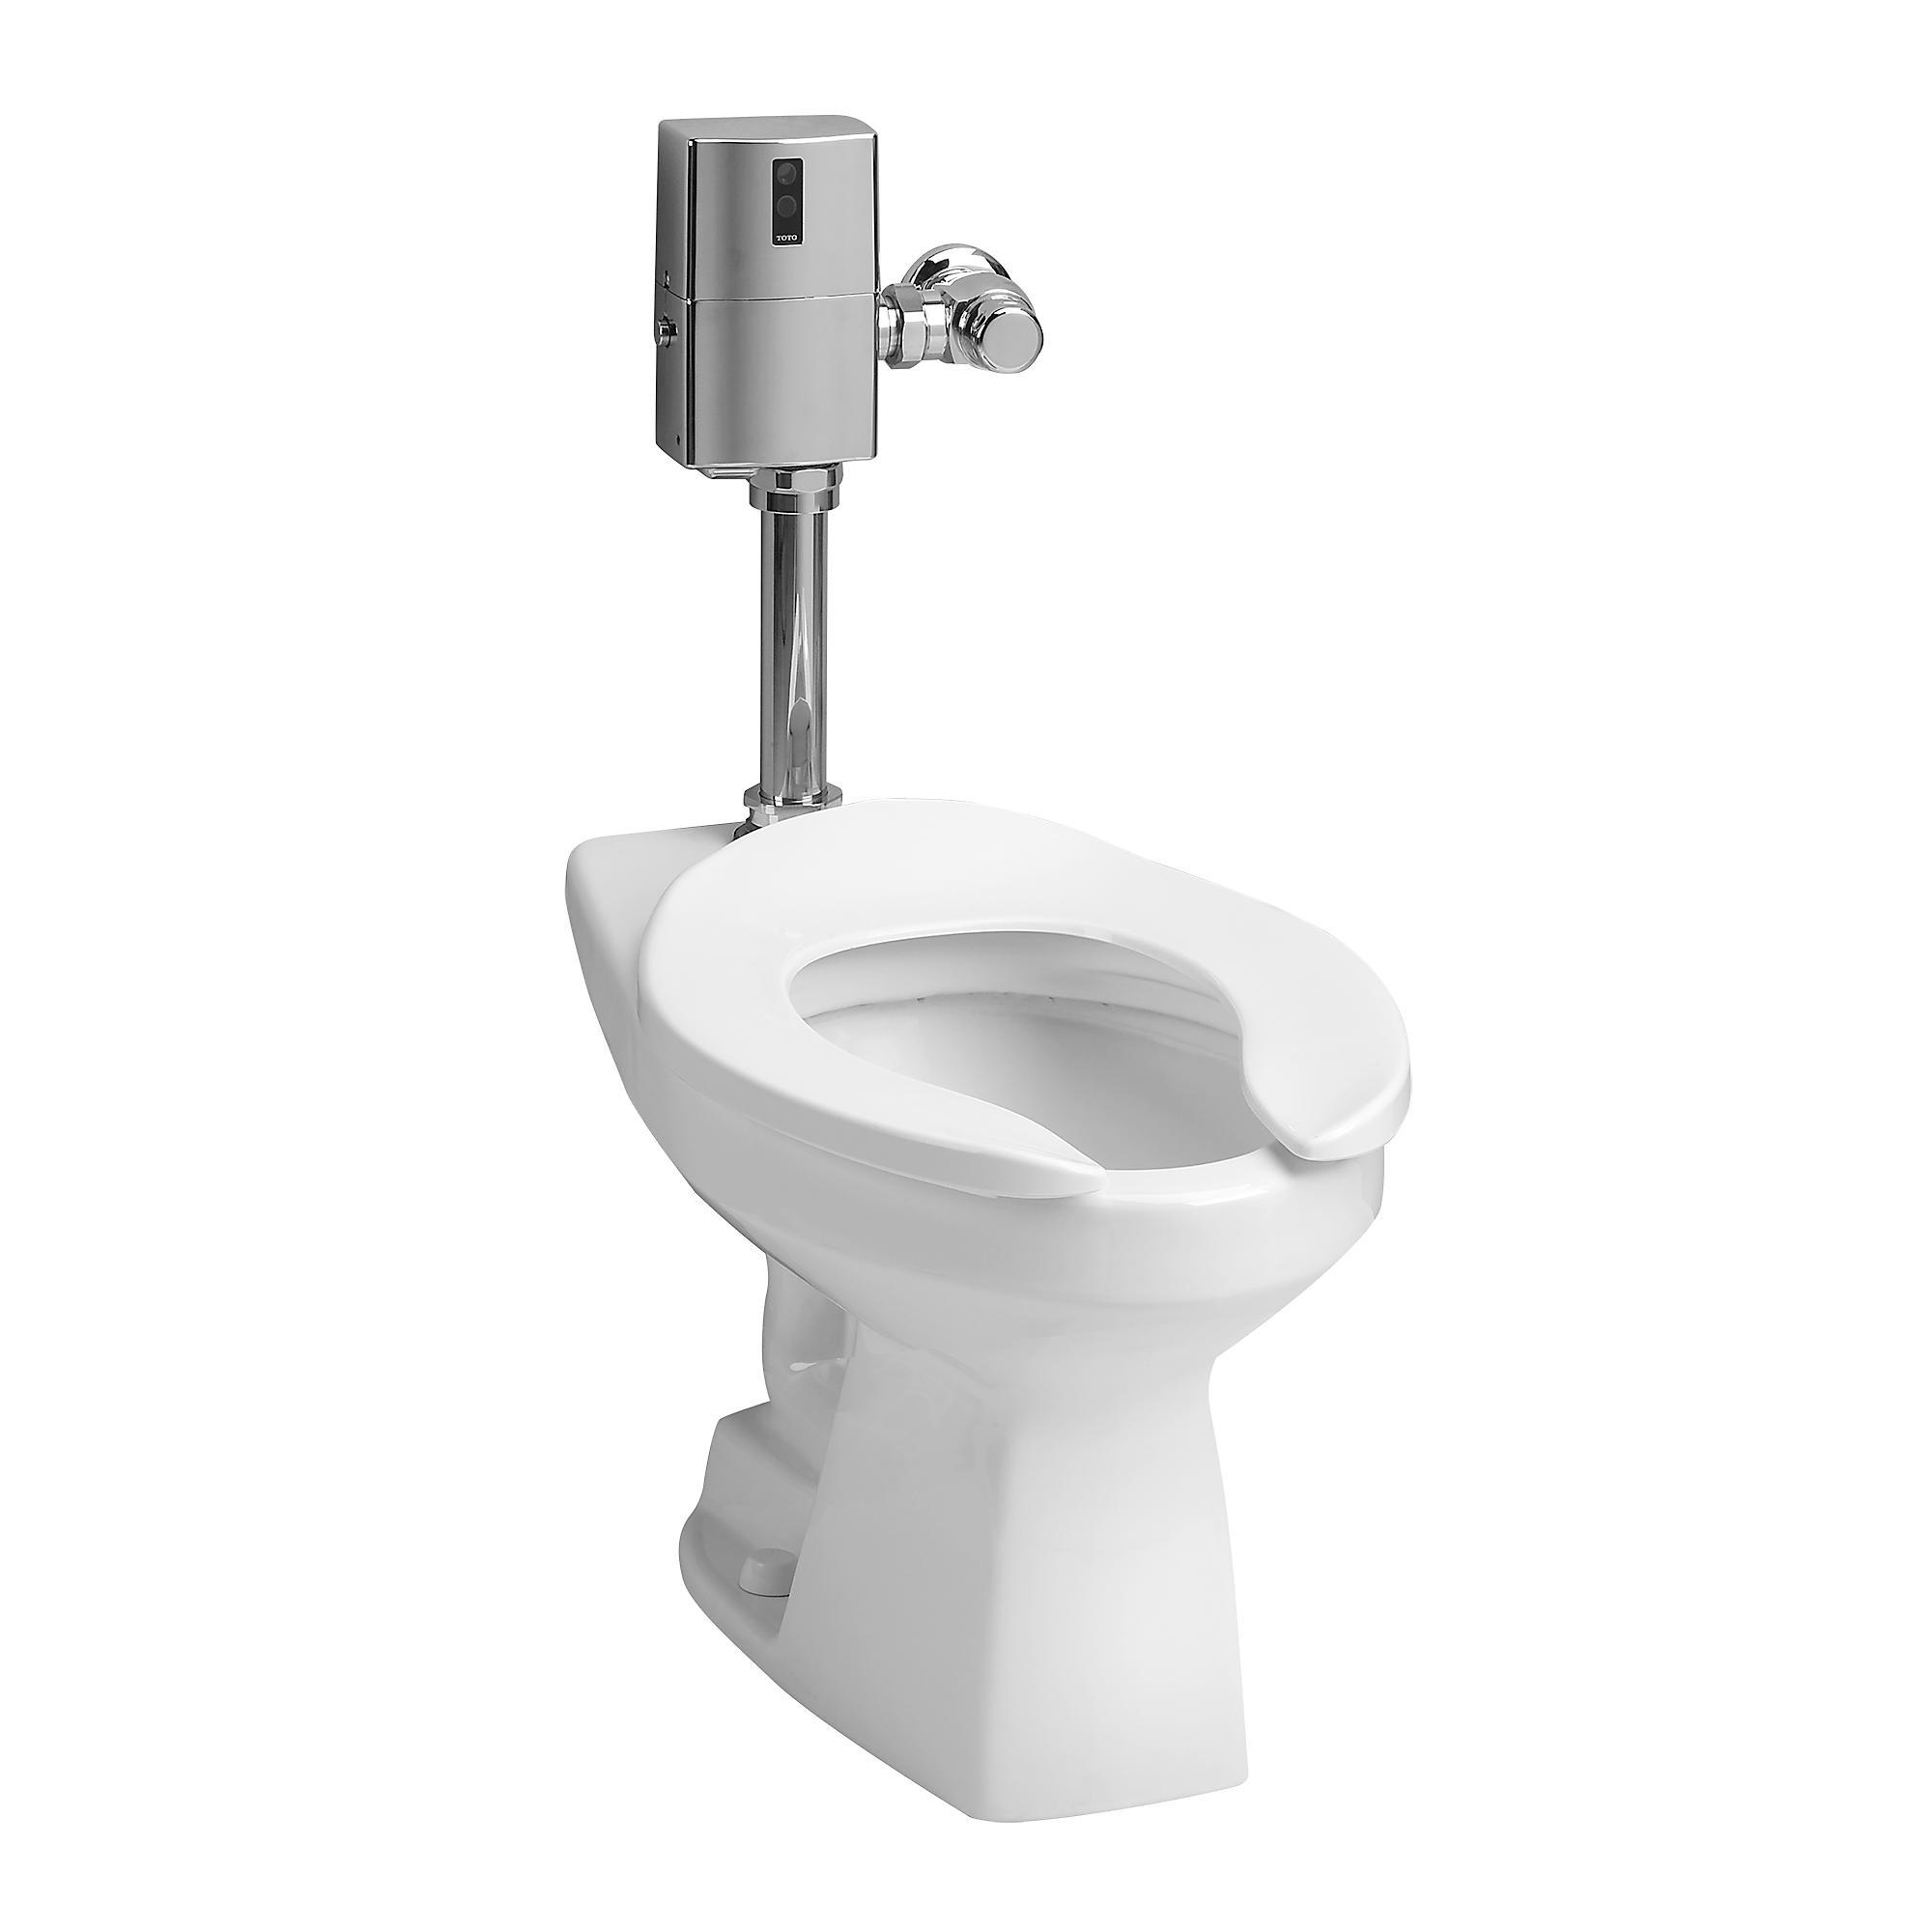 Ct705eln 01 commercial flushometer high efficiency toilet  1 28 gpf  ada compliant  elongated bowl 0